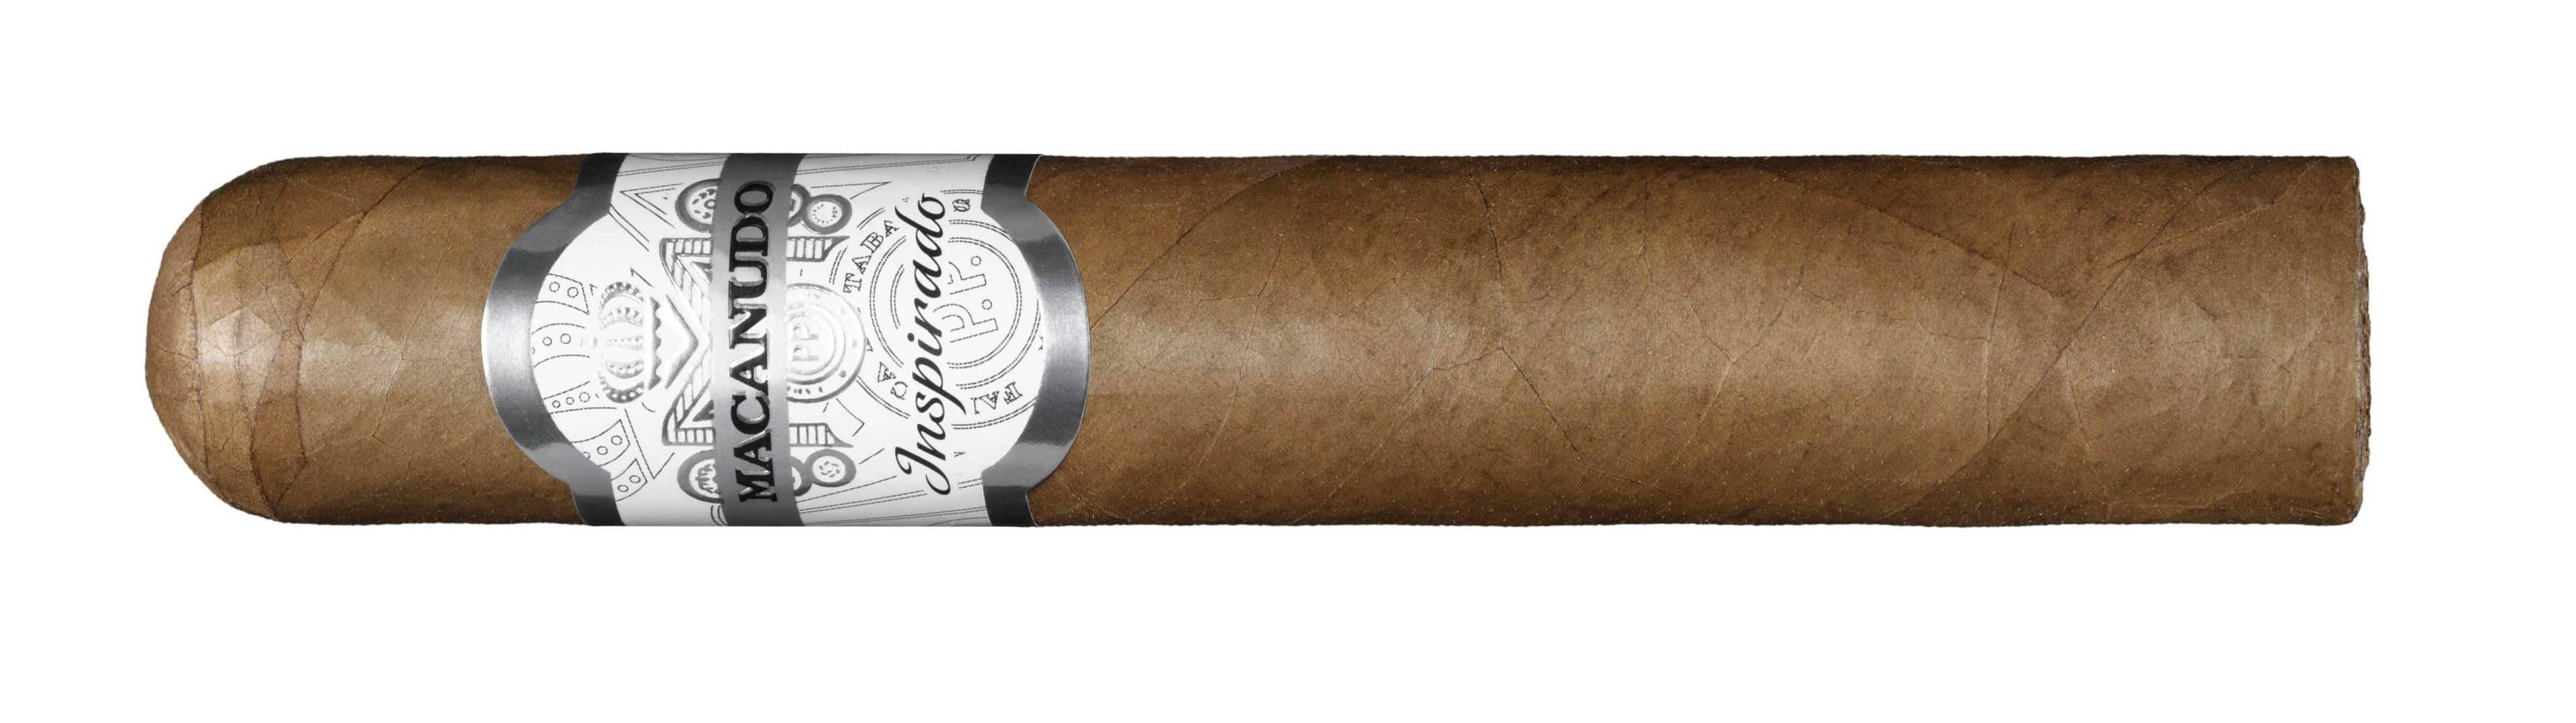 Cigar News: Madanuco Add Two New Sizes to Inspirado White